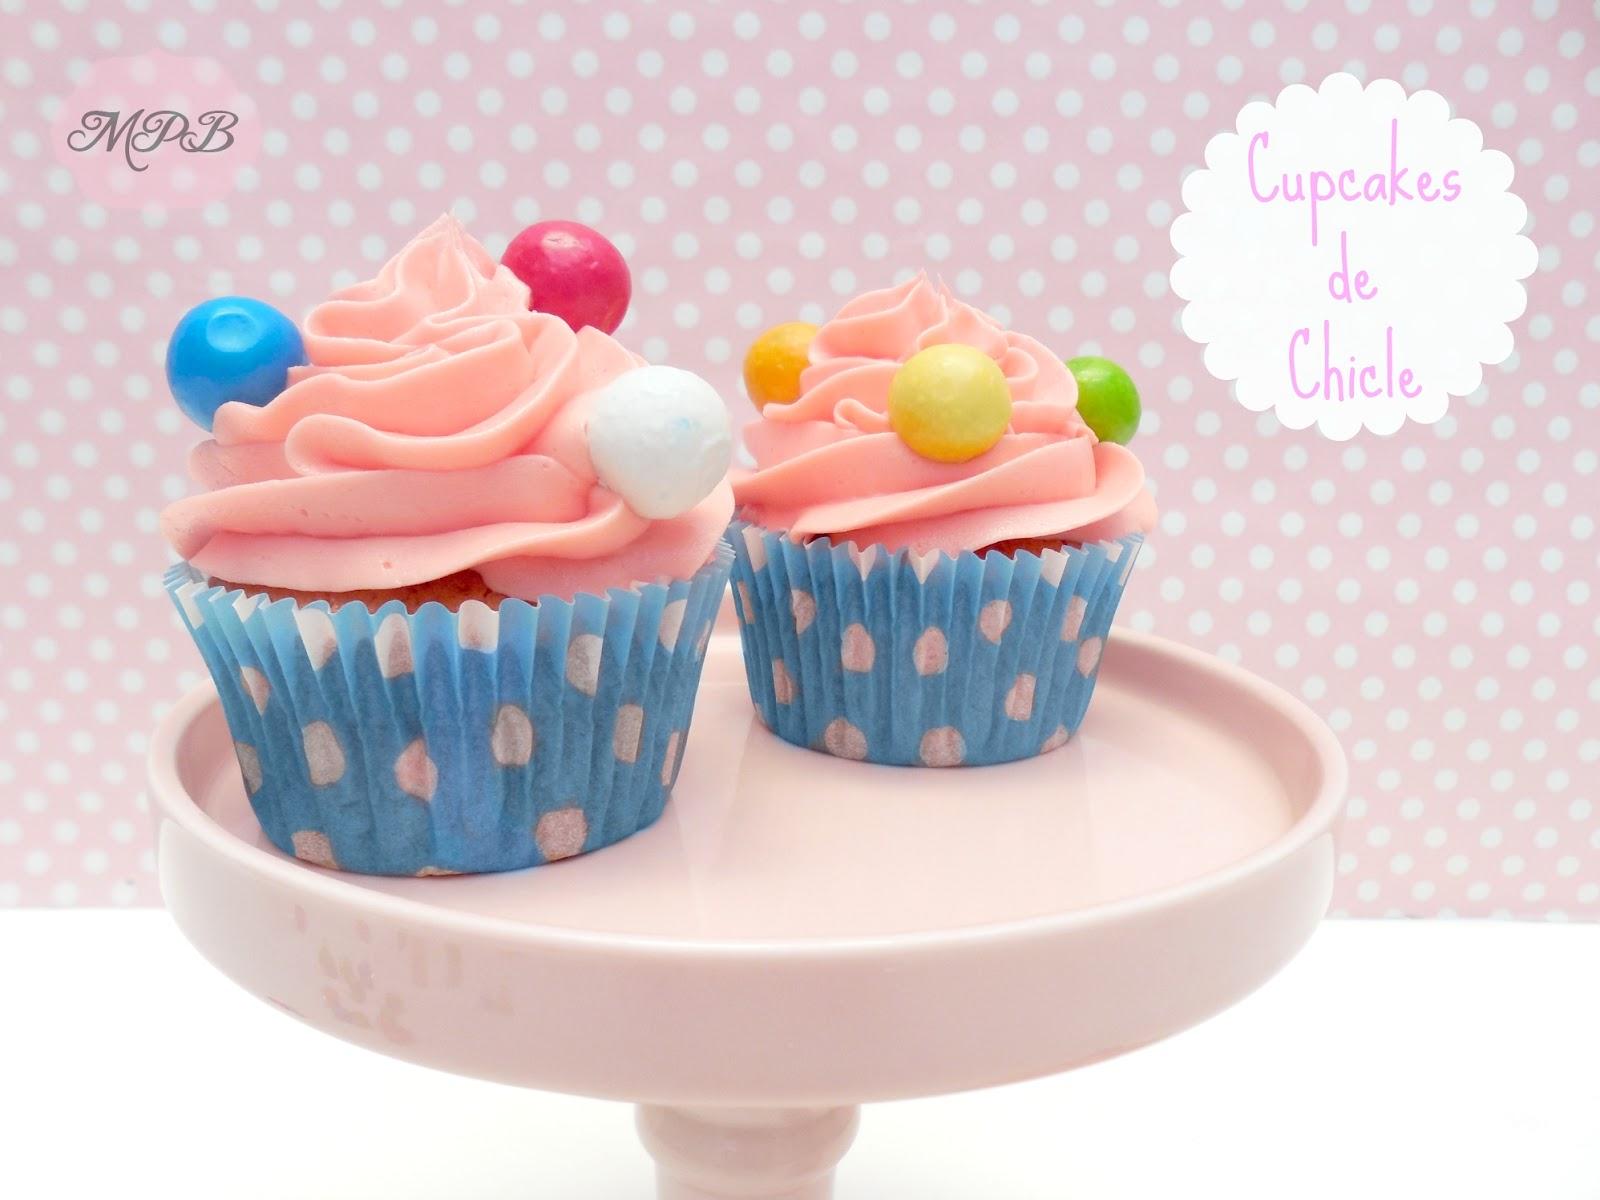 Cupcakes de Chicle